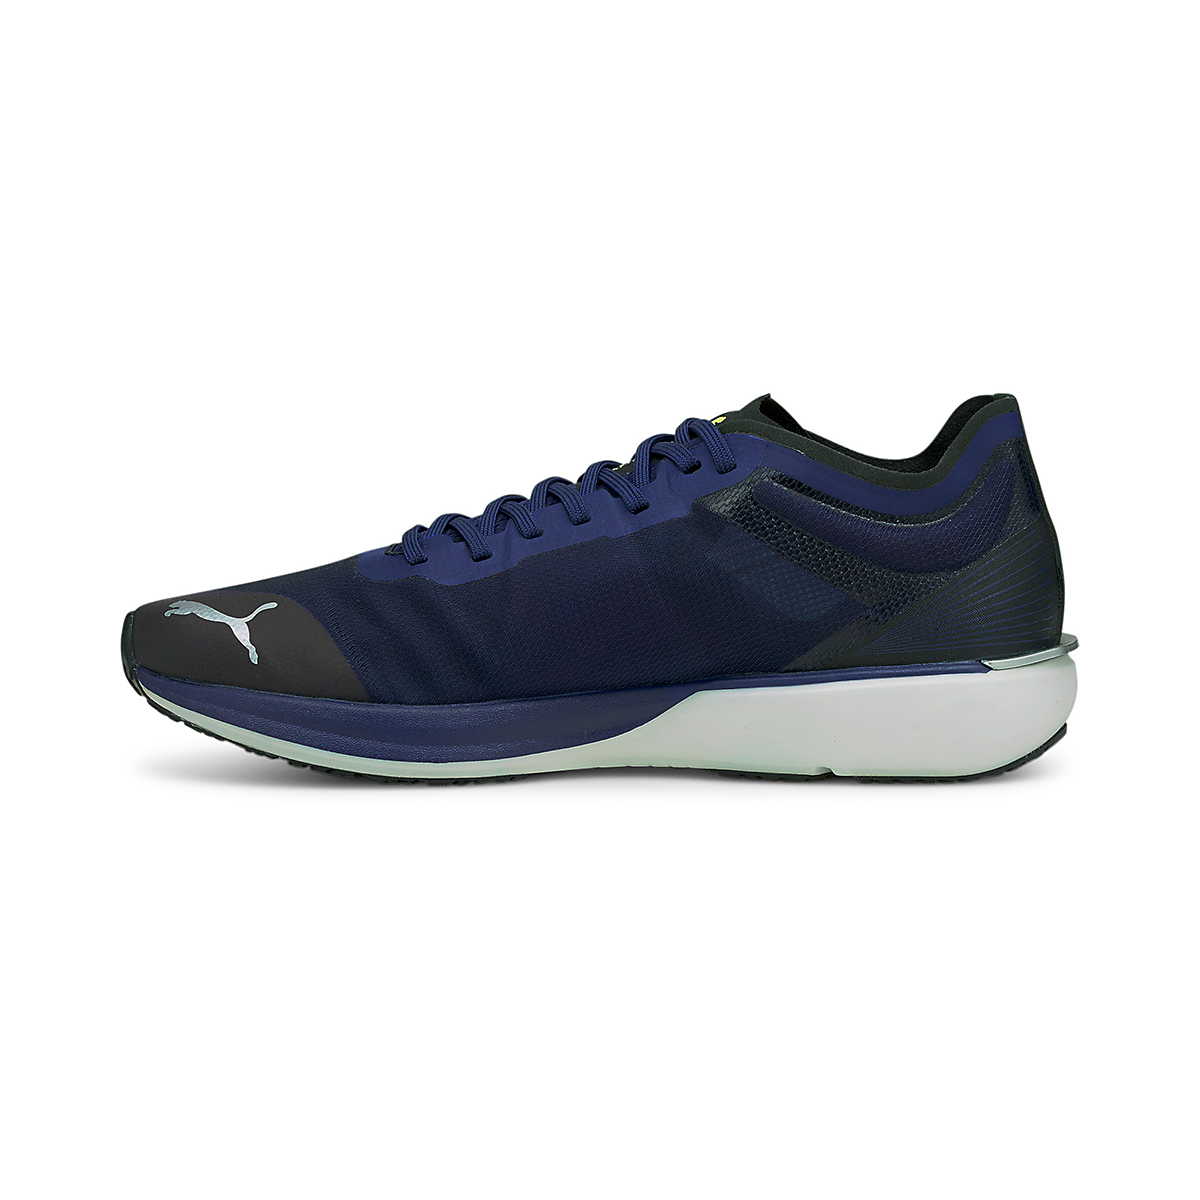 Men's Puma Liberate Nitro Running Shoe - Color: Elektro Blue - Size: 7 - Width: Regular, Elektro Blue, large, image 2